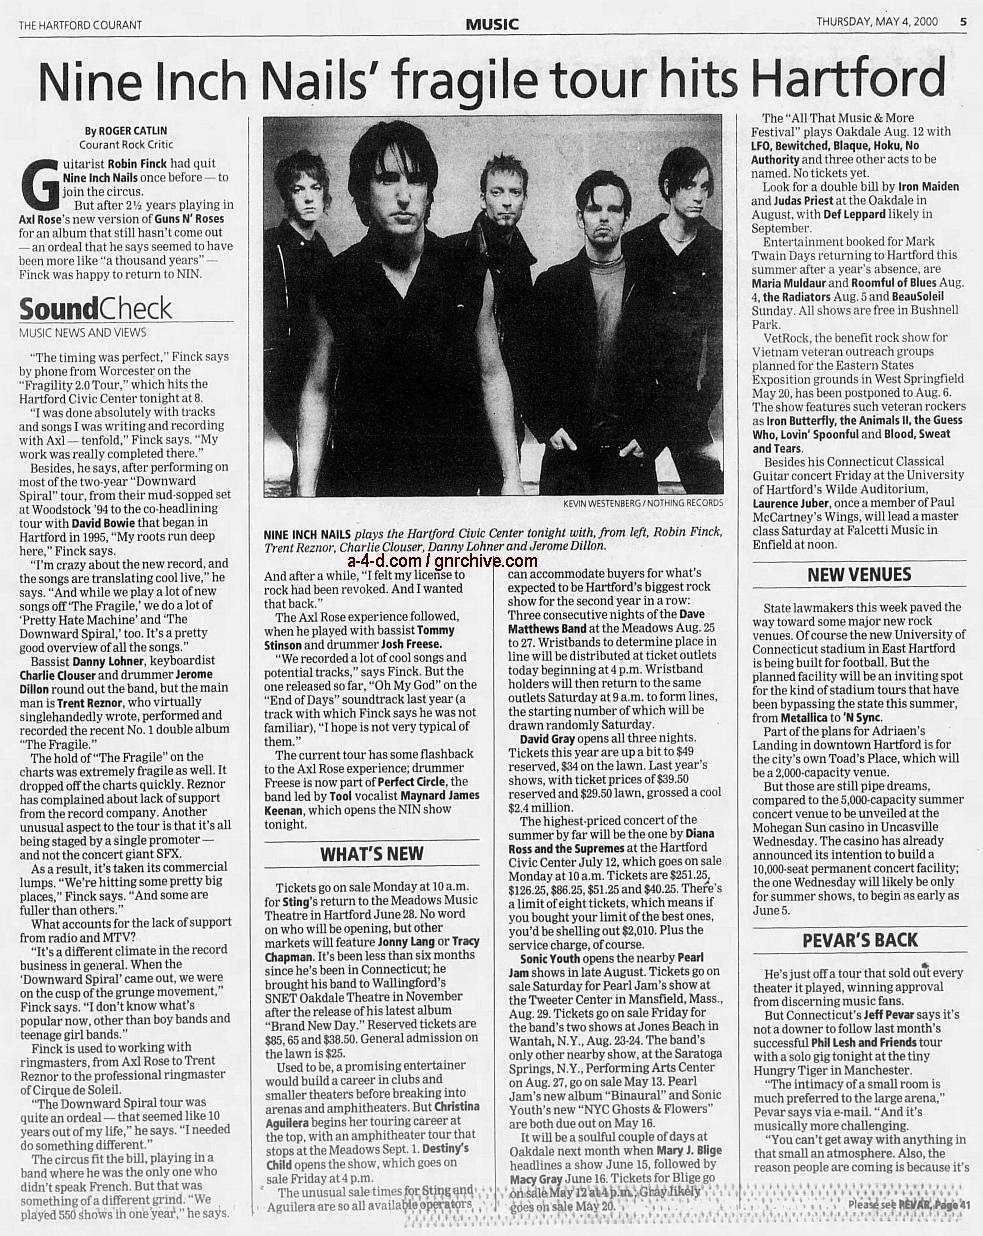 2000.05.04 - Hartford Courant - Nine Inch Nails' Fragile Tour Hits Hartford (Robin) 2000_016